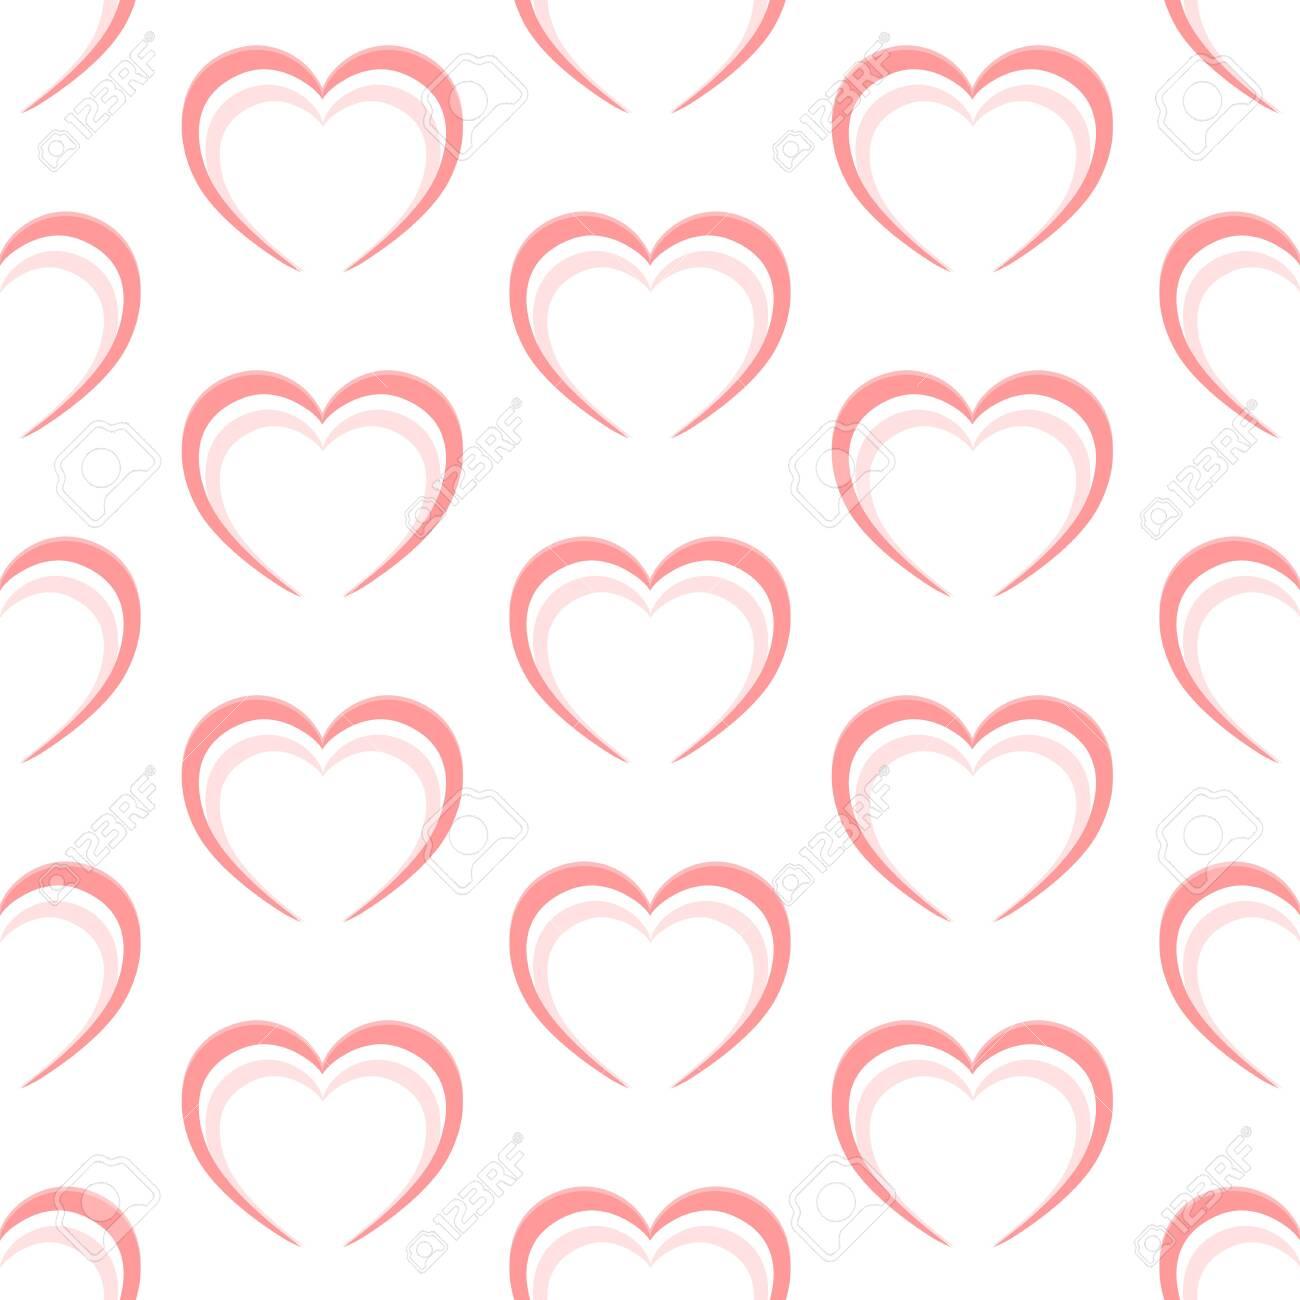 Abstract pink heart seamless pattern. Vector illustration - 143742183